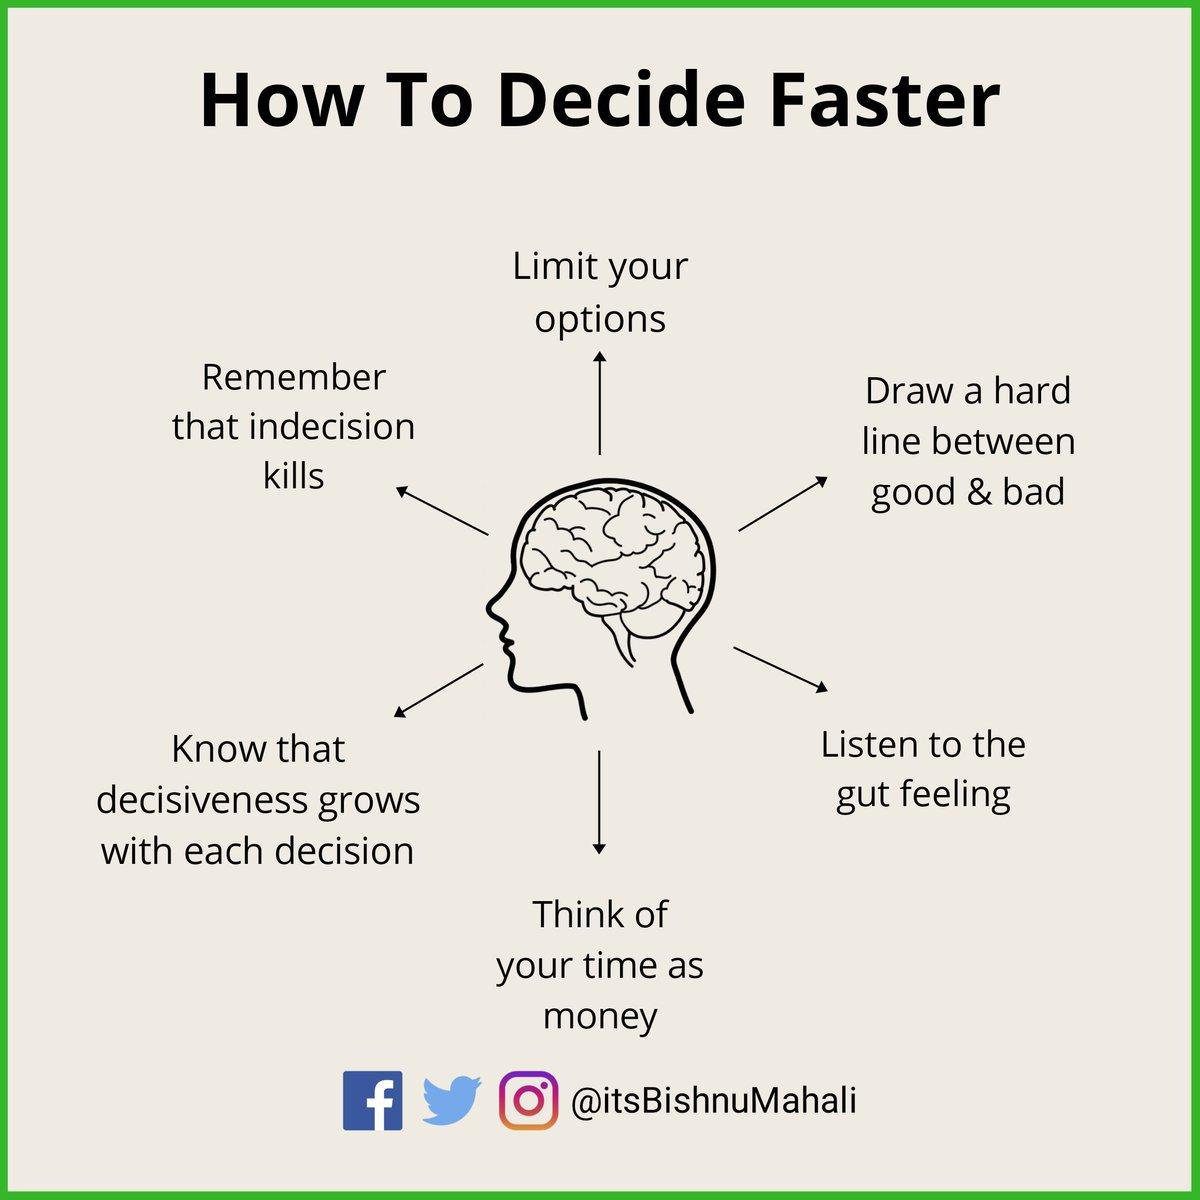 A mindset for making faster decision.   #mind #mindset #entrepreneur #entrepreneurmindset #leadership #mindsetiseverything ##positivemindset #persistence #mindsetiskey #posibilities #changeyourlife #changeyourmind #revolutionpic.twitter.com/nYoaYh2pVZ